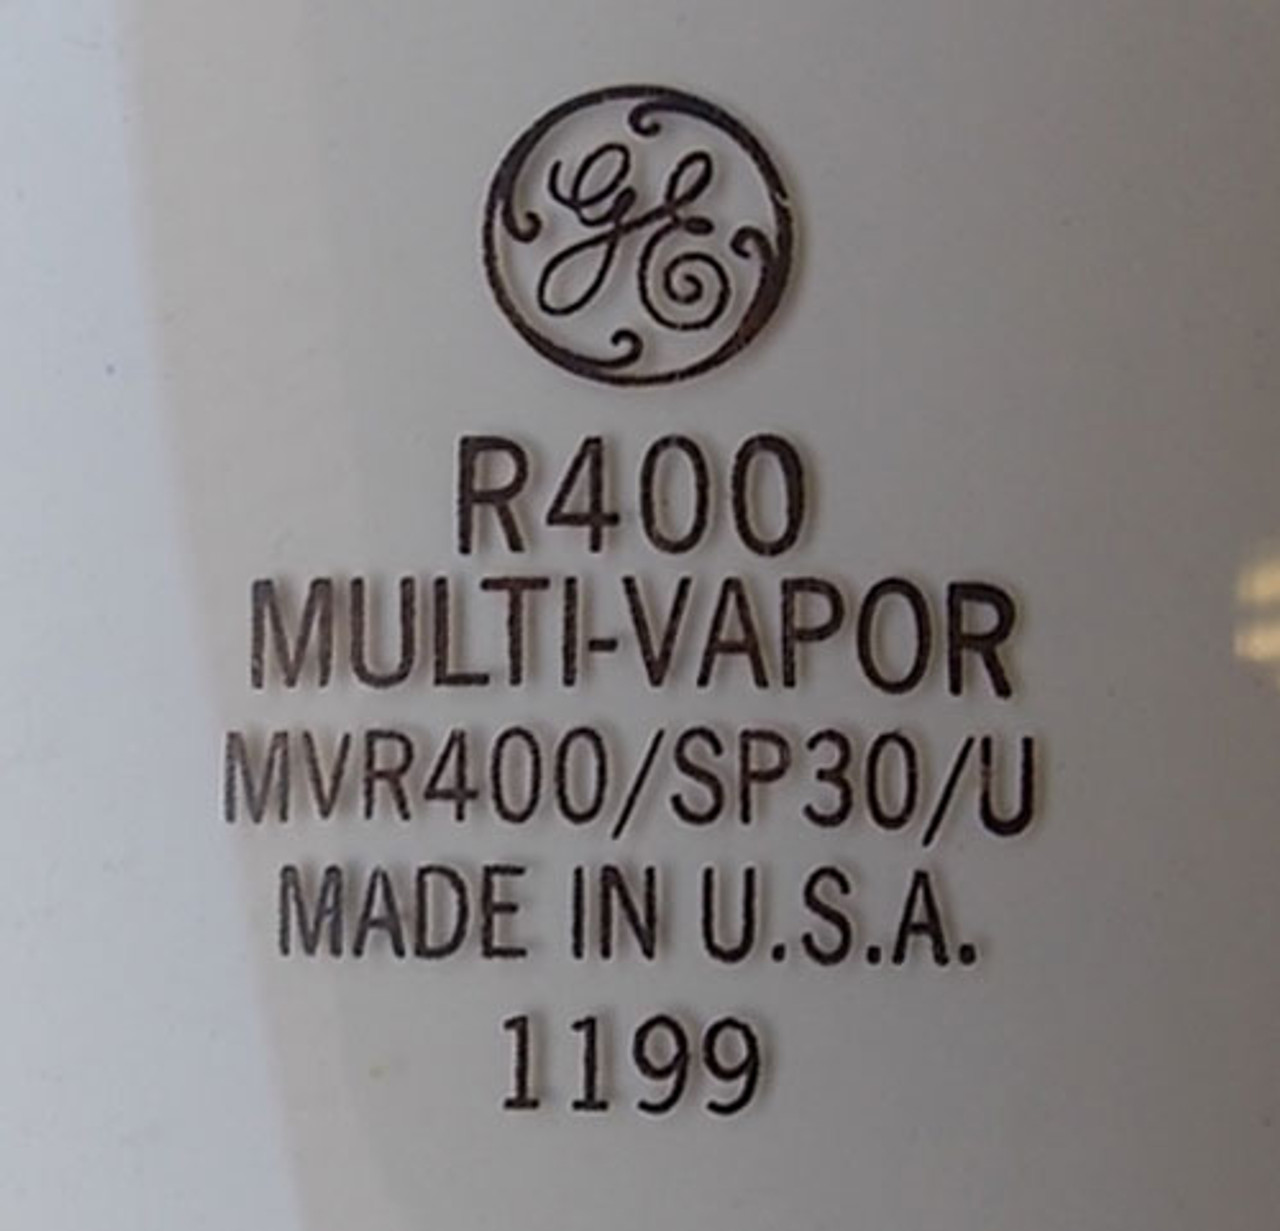 GE MVR400/SP30/U 400W E-37 Bulb Coated Multi-Vapor Quartz Metal Halide